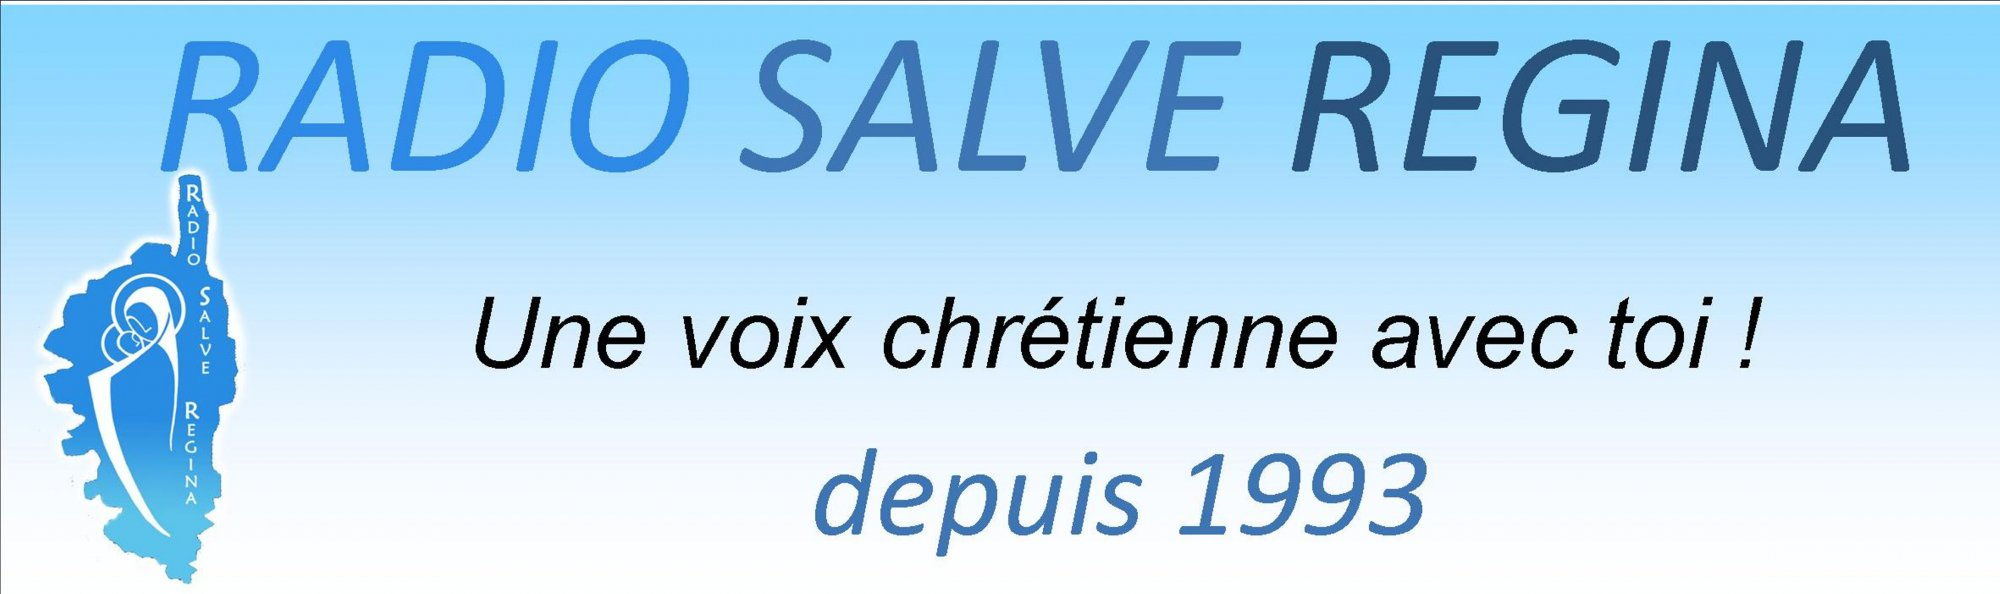 143721-radio-salve-regina